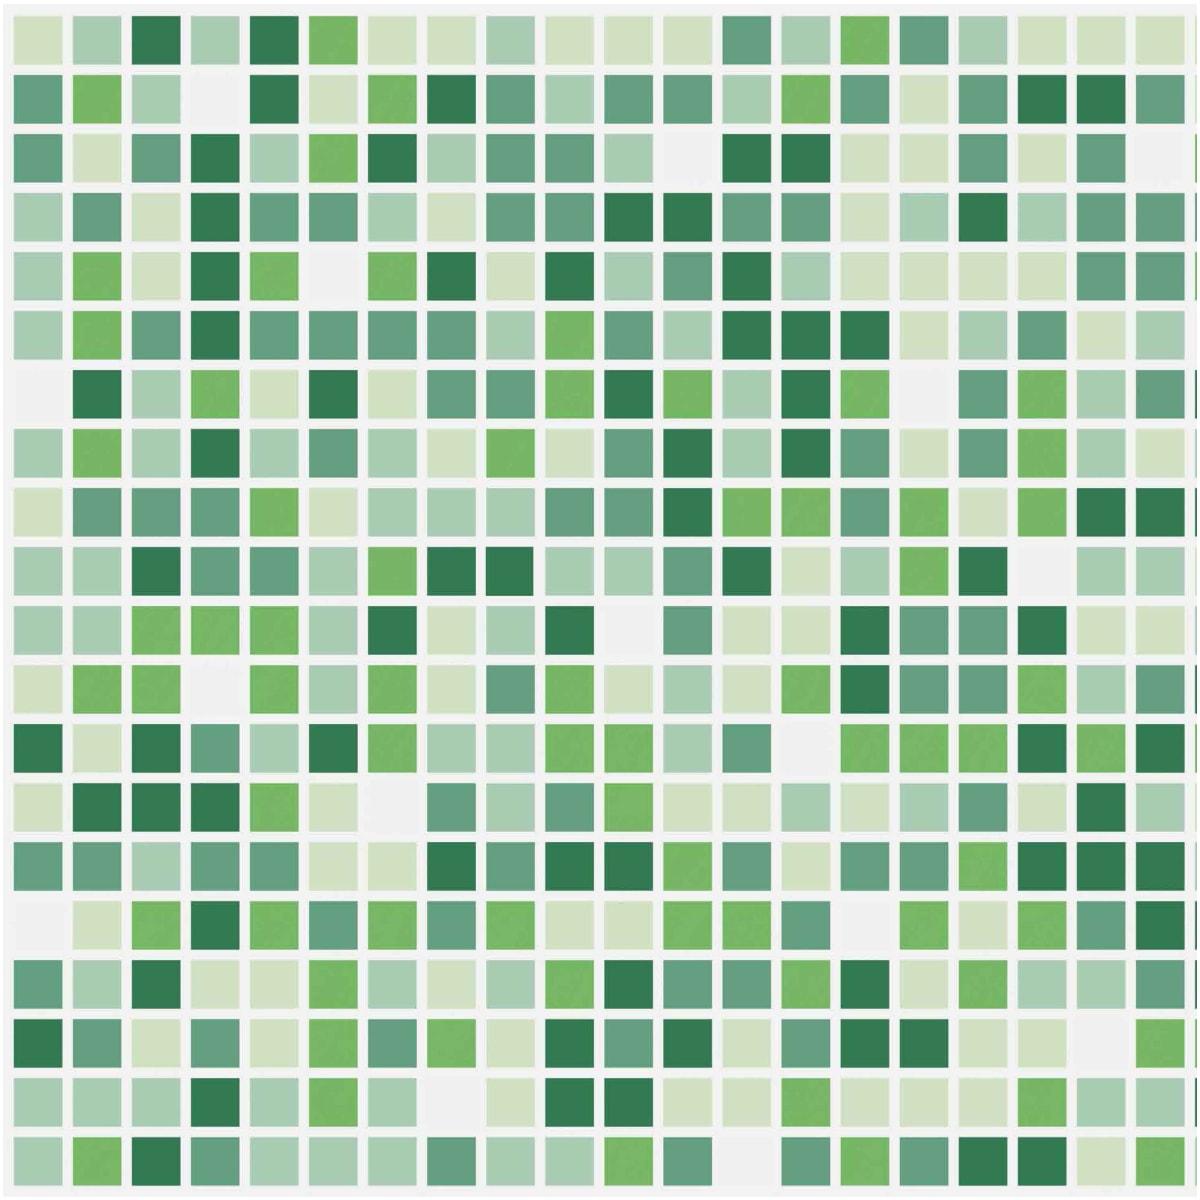 Панель ПВХ листовая 3 мм 960х480 мм Весна мозаика 0.46 м²